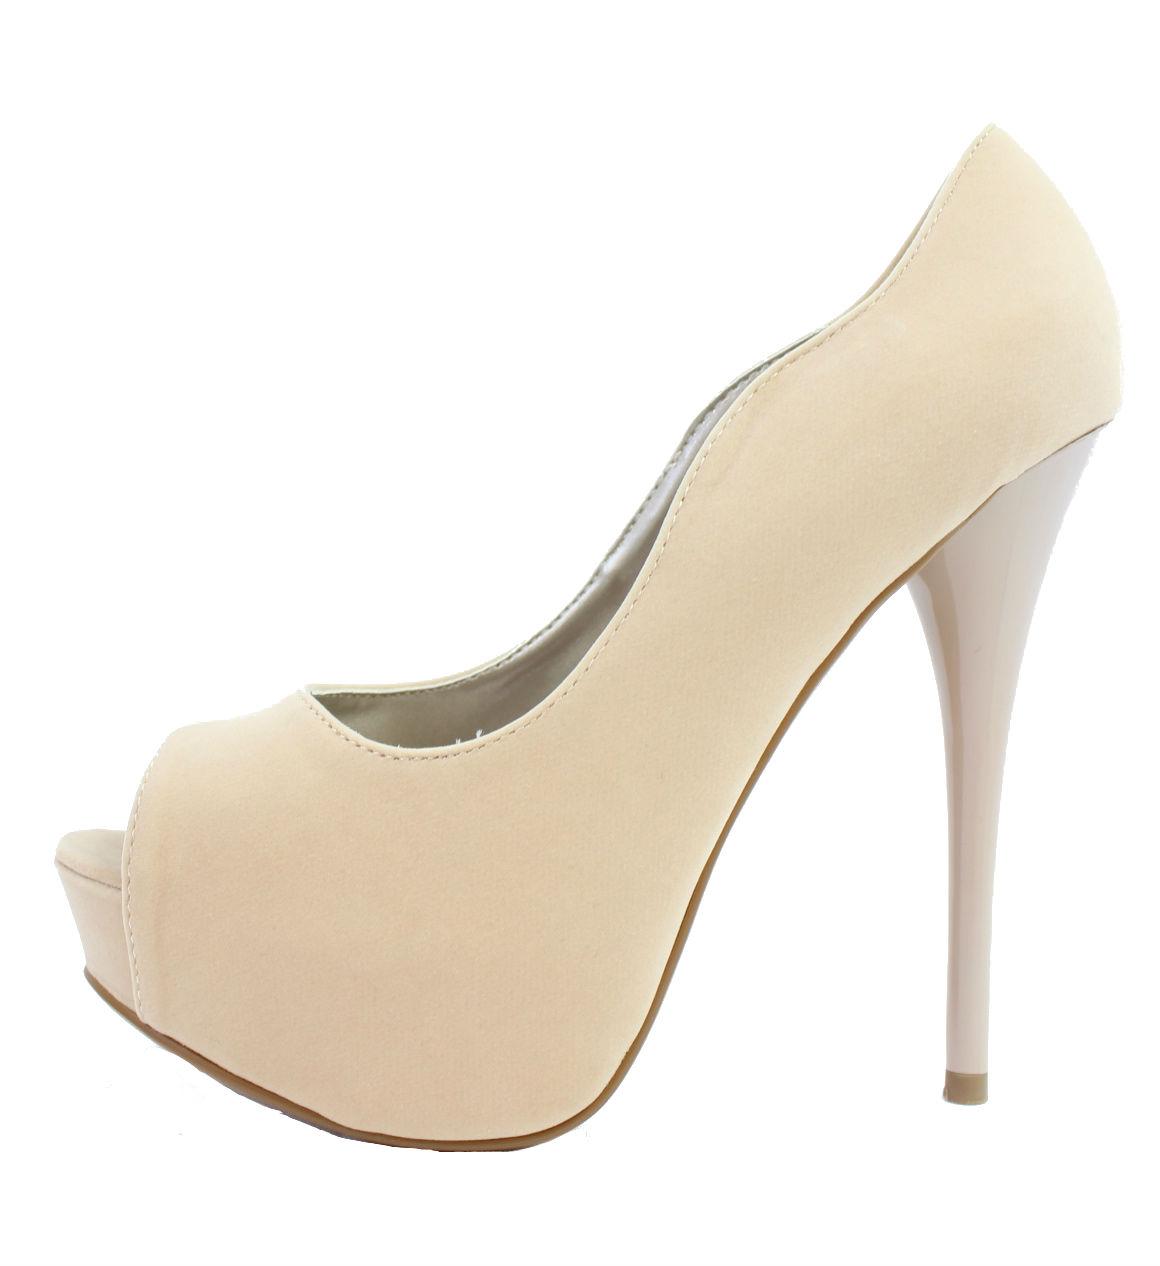 qupid neutral nude | wowtrendz | platform high heels pumps